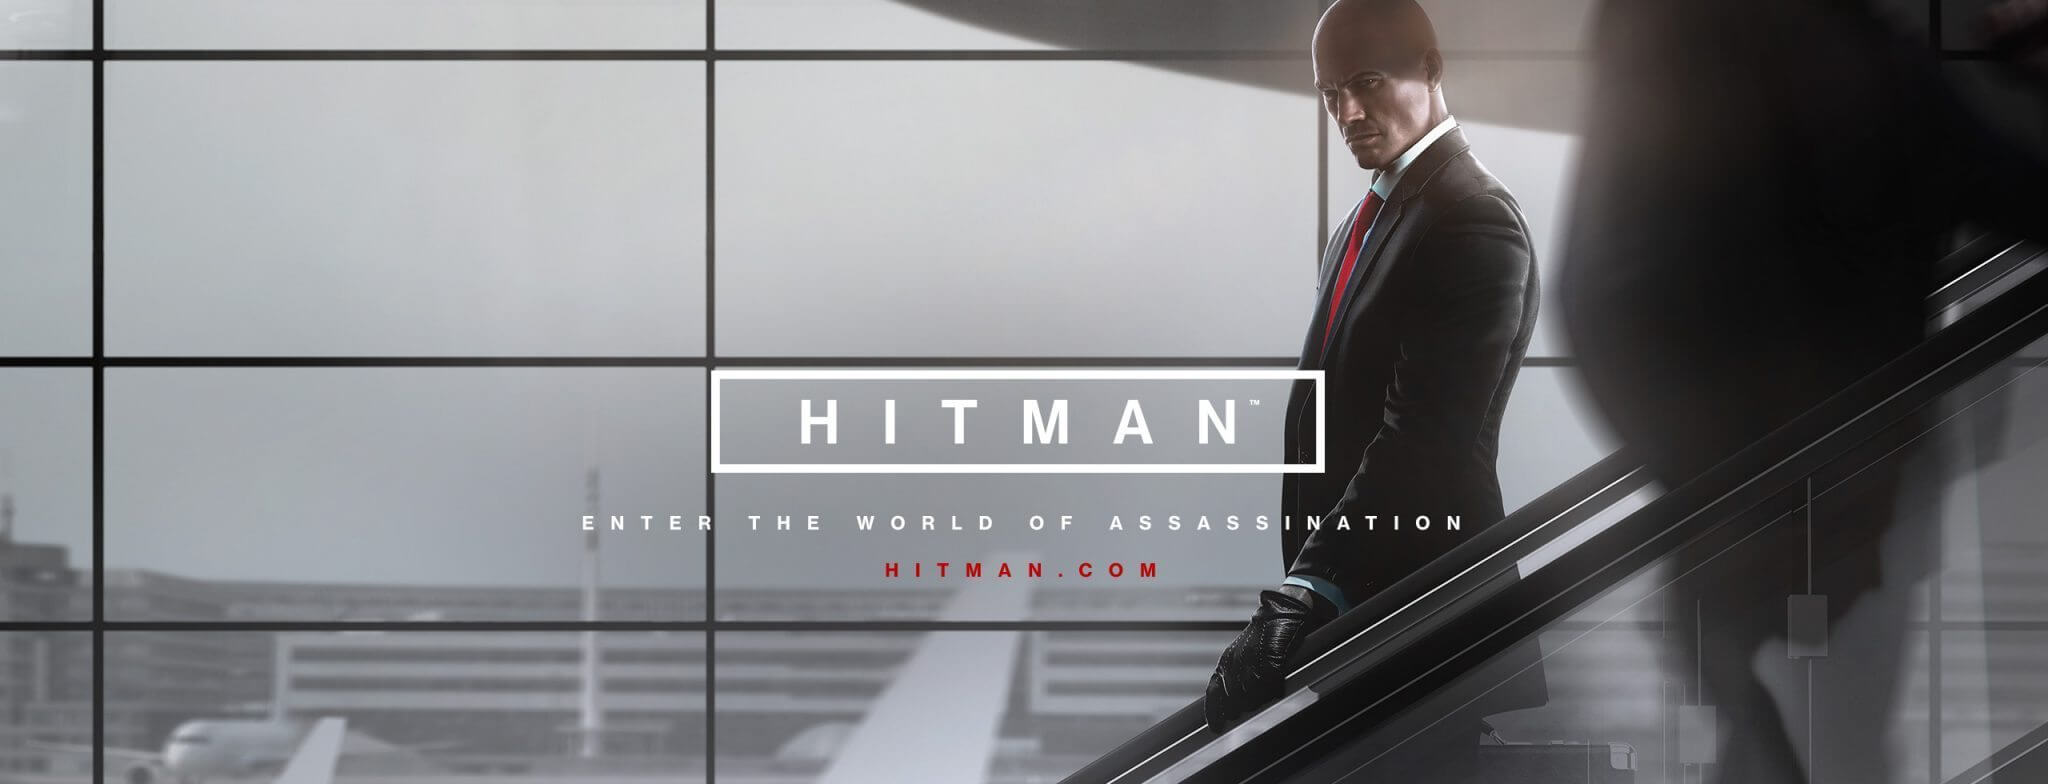 hitman_marquee_1